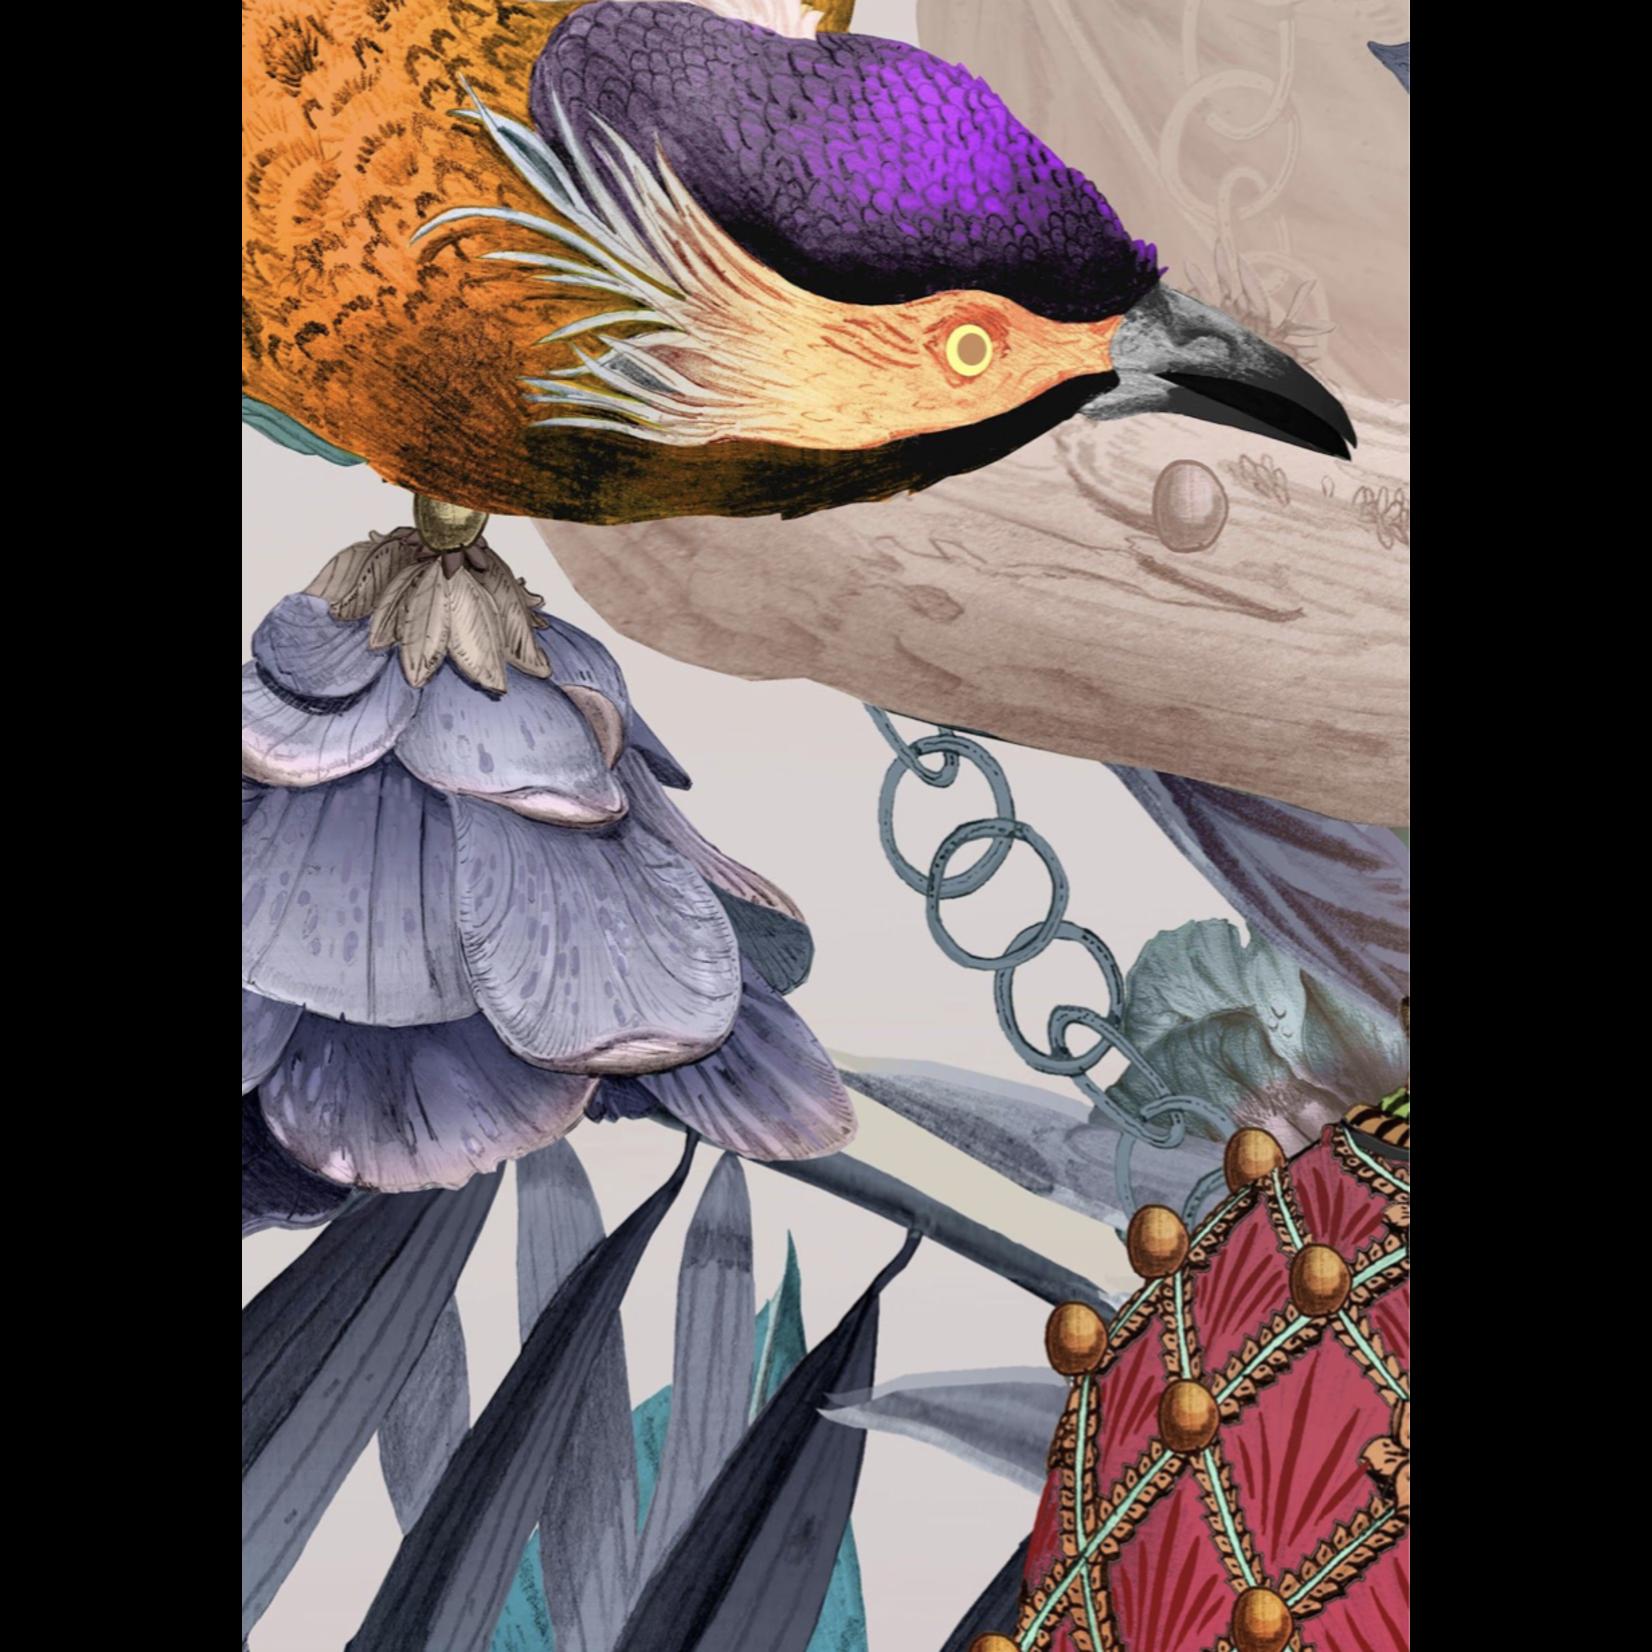 Kit Miles Ecclesiastical Botanica | Magentas | Panel B